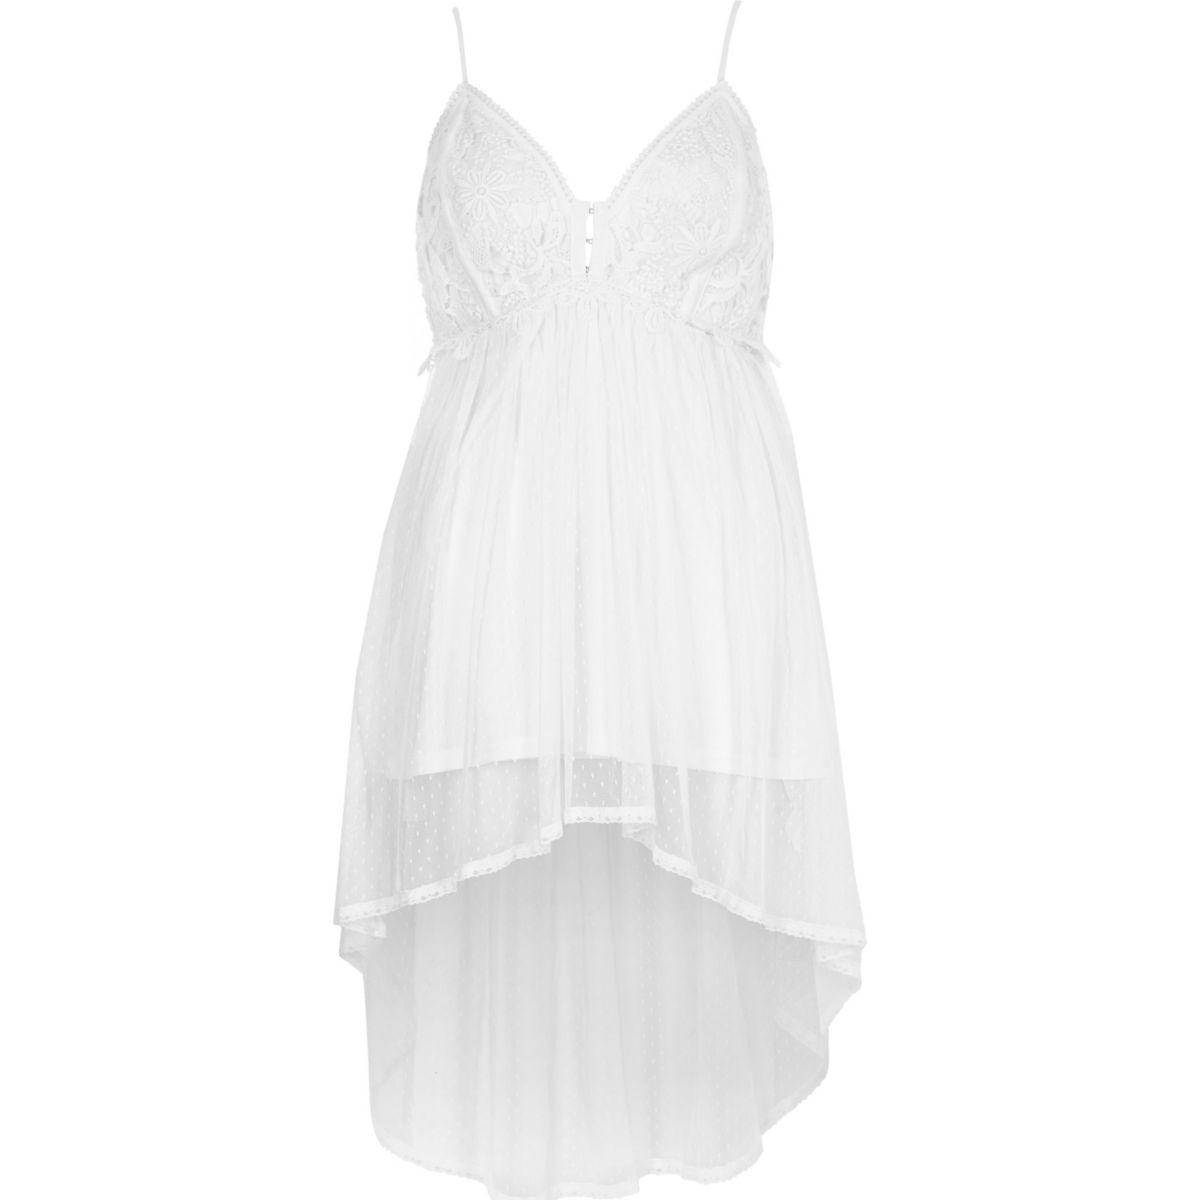 White lace longline cami top